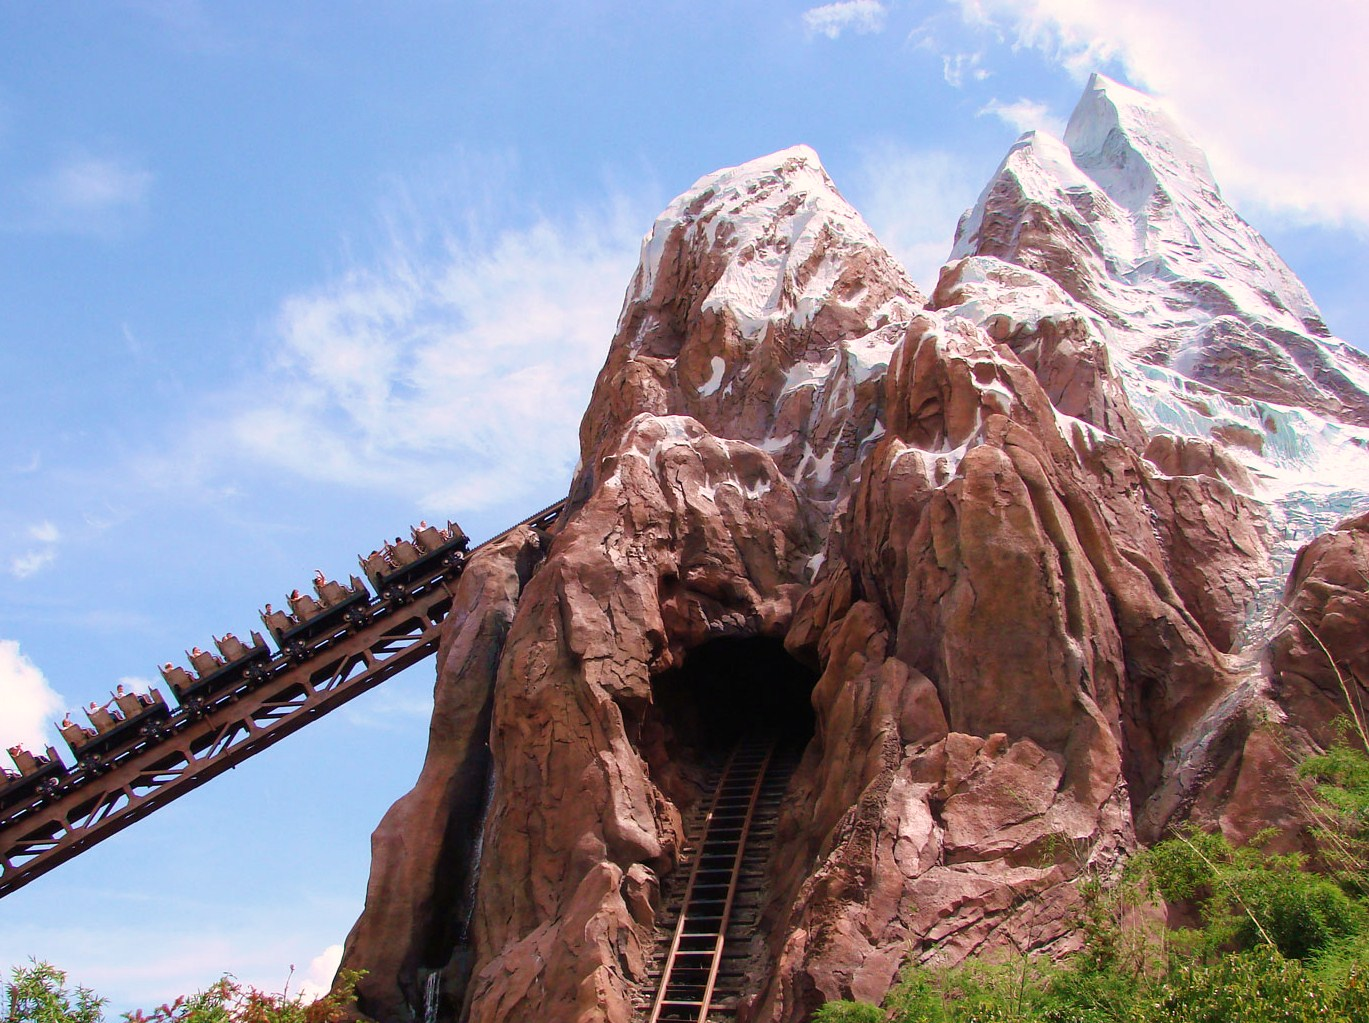 Expedition Everest ~ The Dias Family Adventures